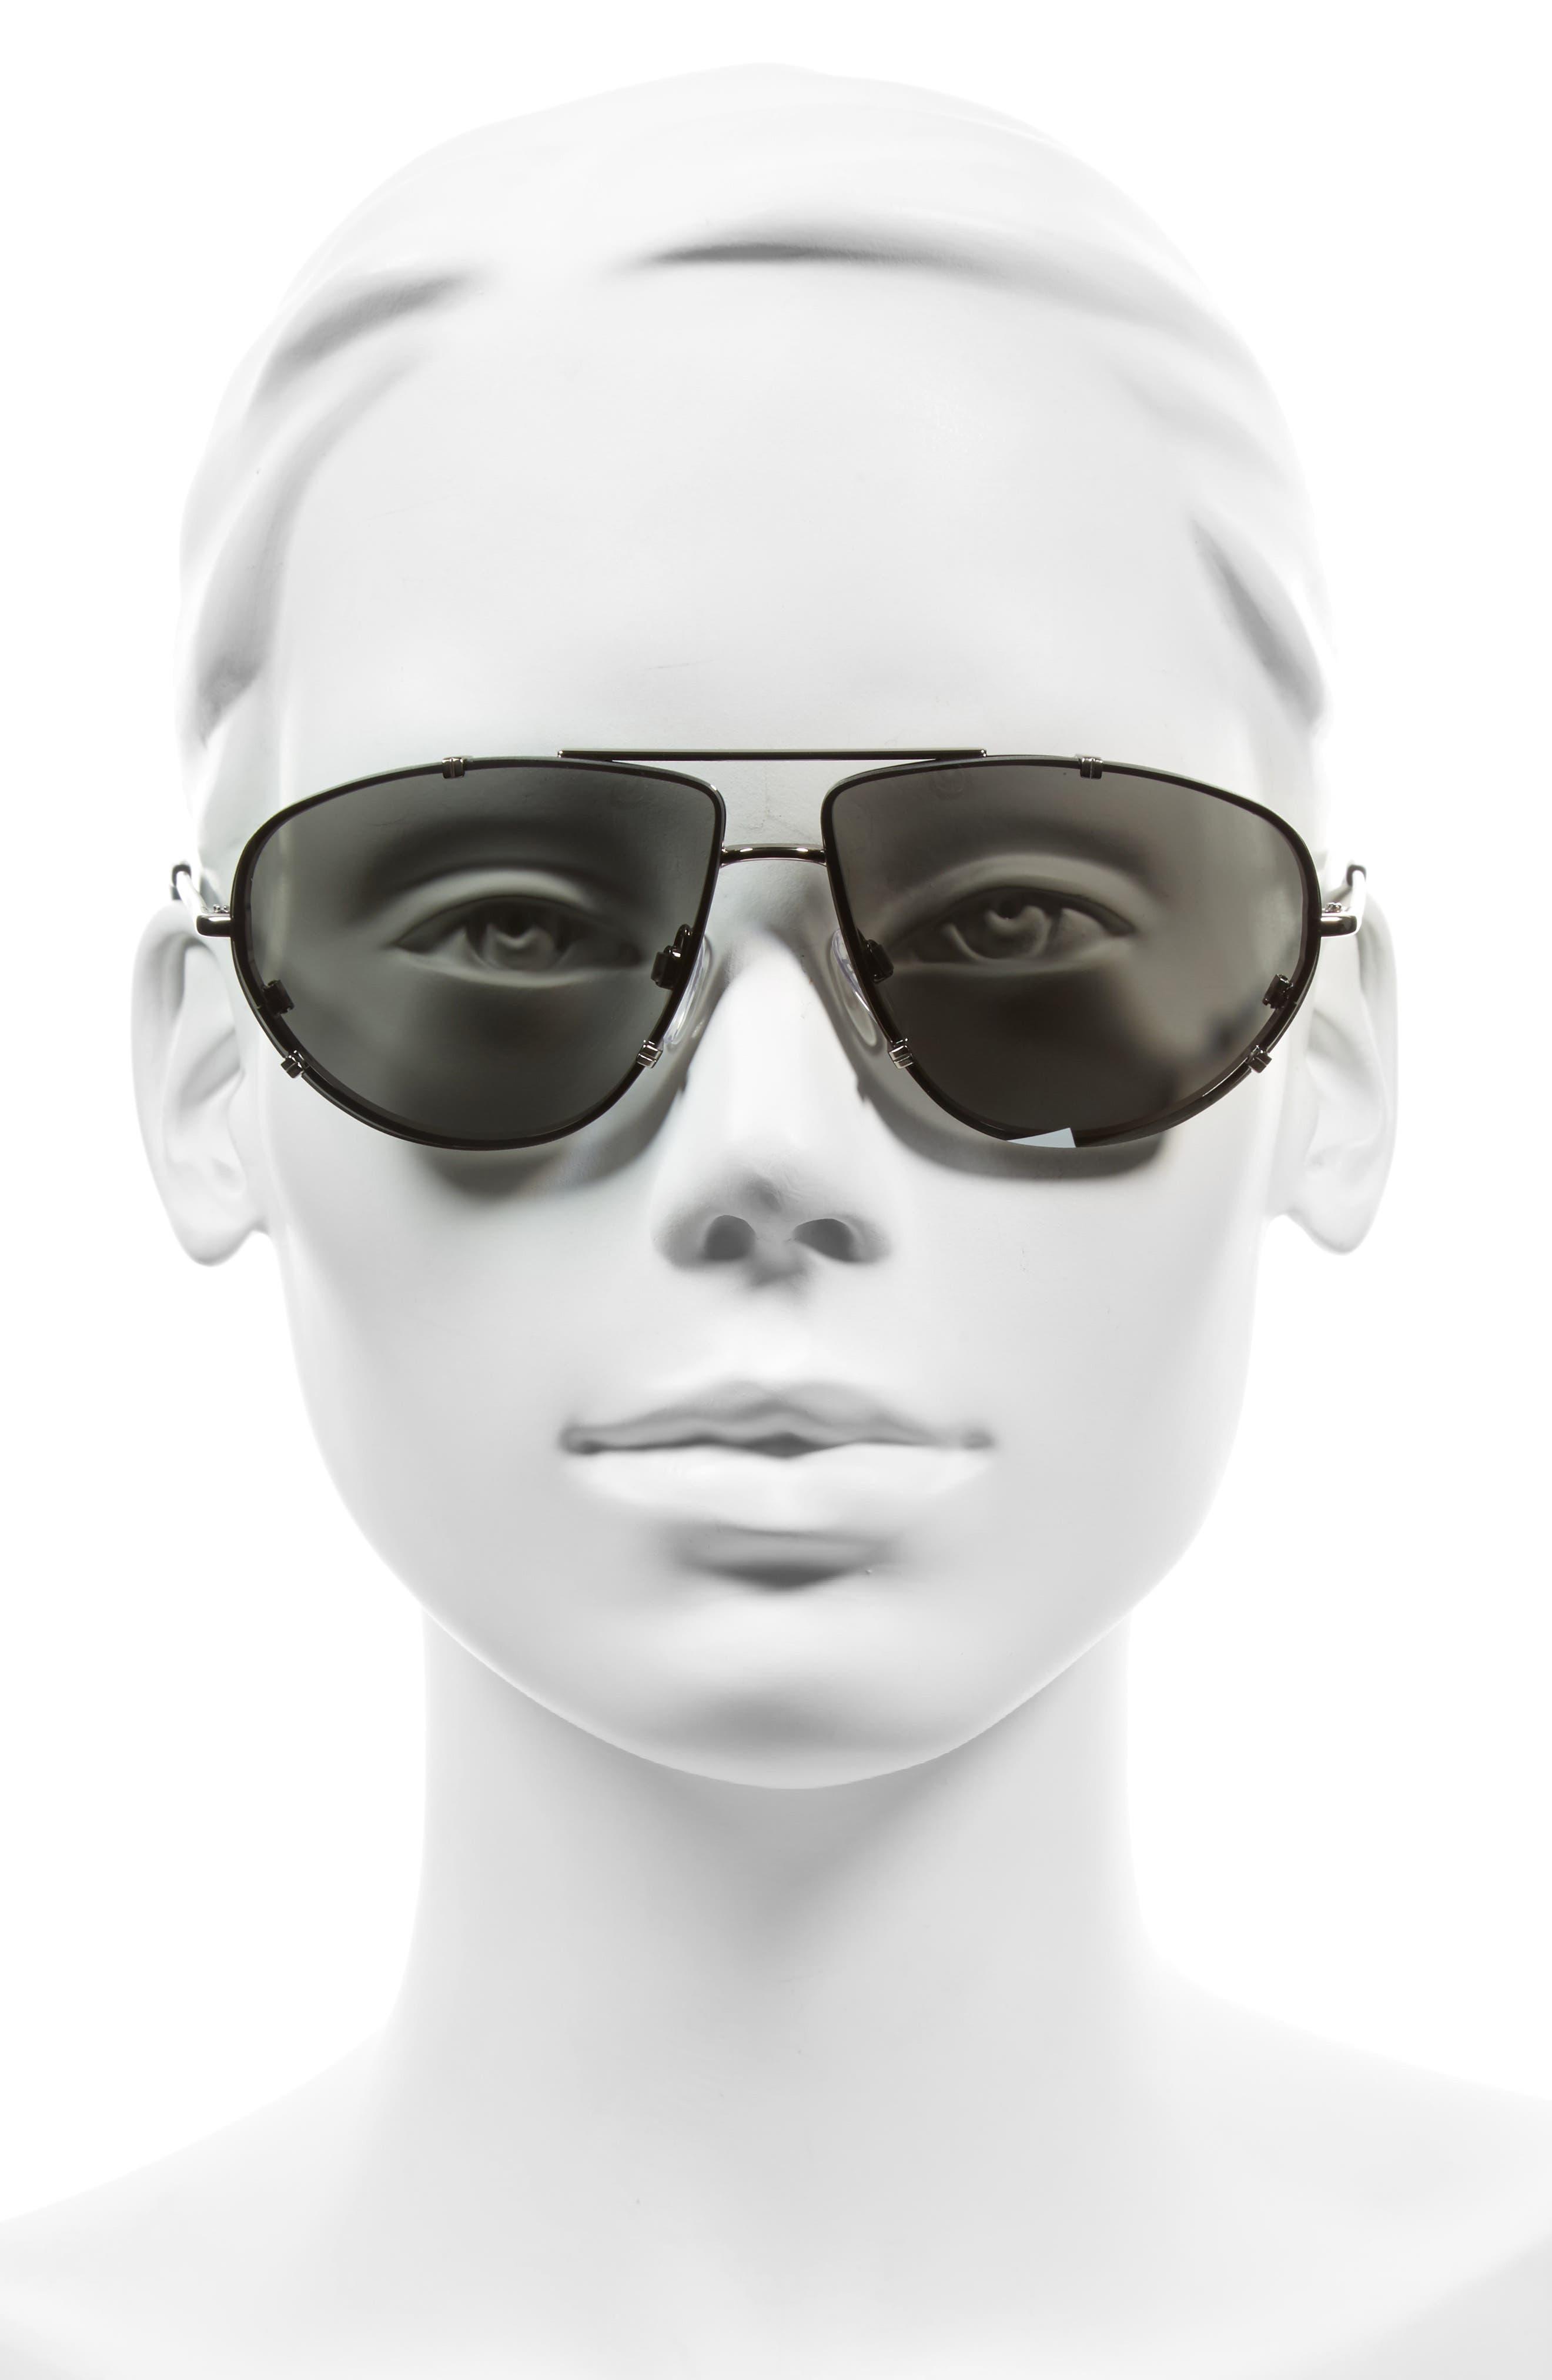 62mm Aviator Sunglasses,                             Alternate thumbnail 2, color,                             Ruthenium/ Black/ Smoke Mirror